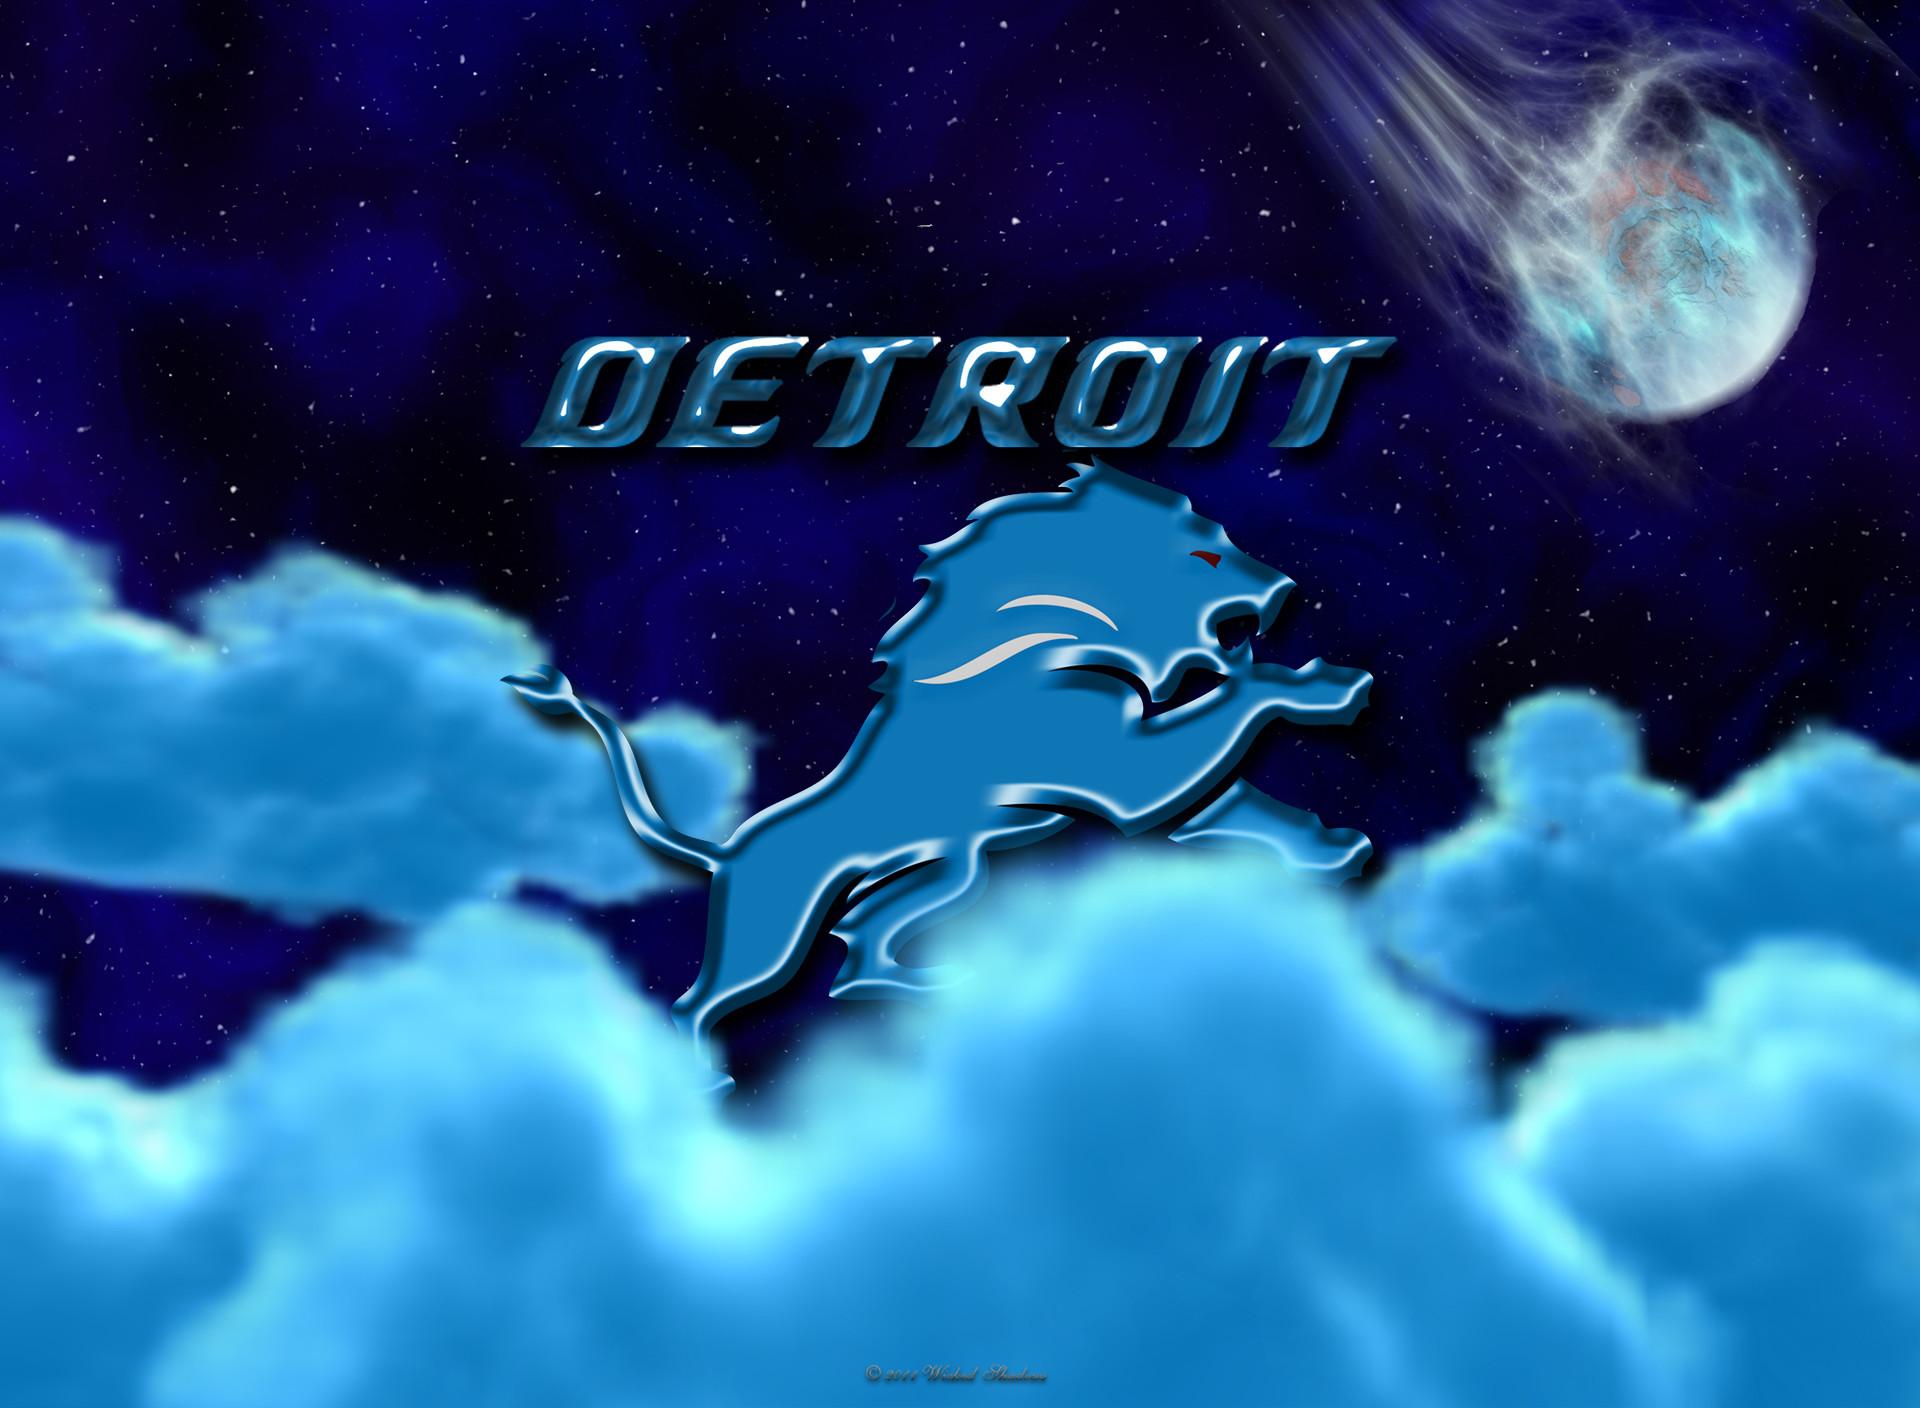 Detroit Lions Above The Clouds wallpaper